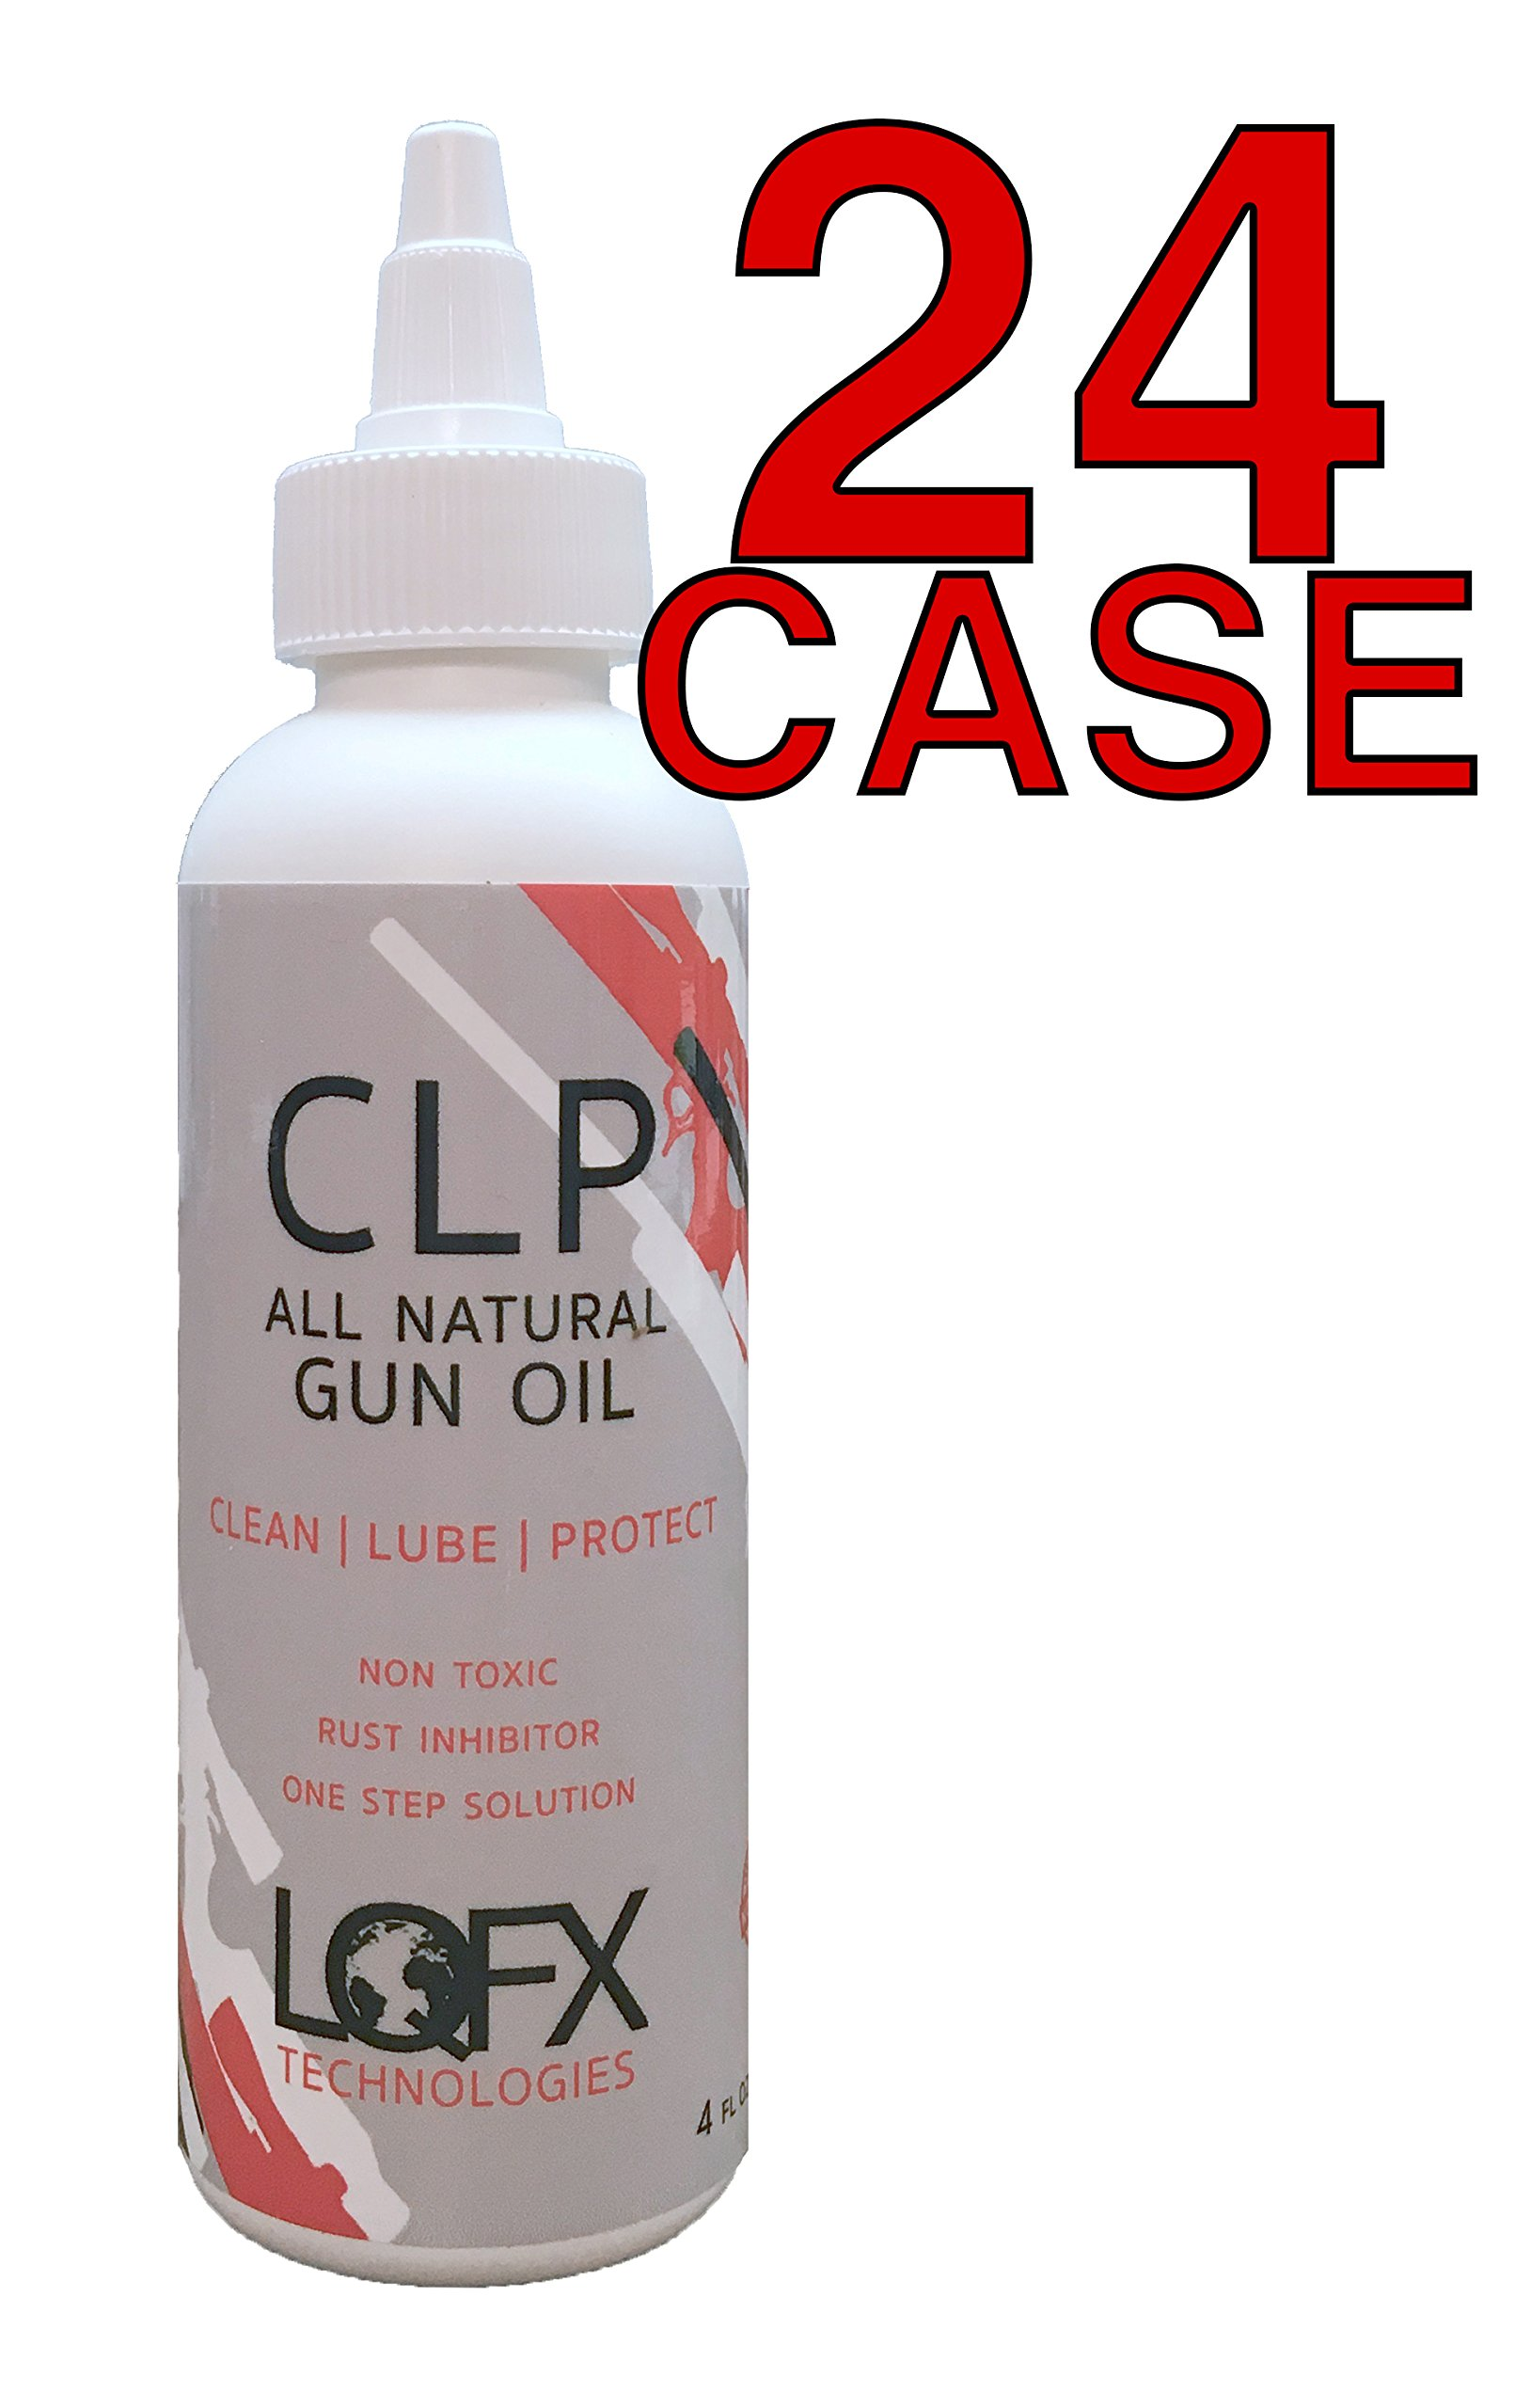 Liquifix LQFX Technologies CLP All Natural Gun Oil 4oz CASE of 24 by Liquifix